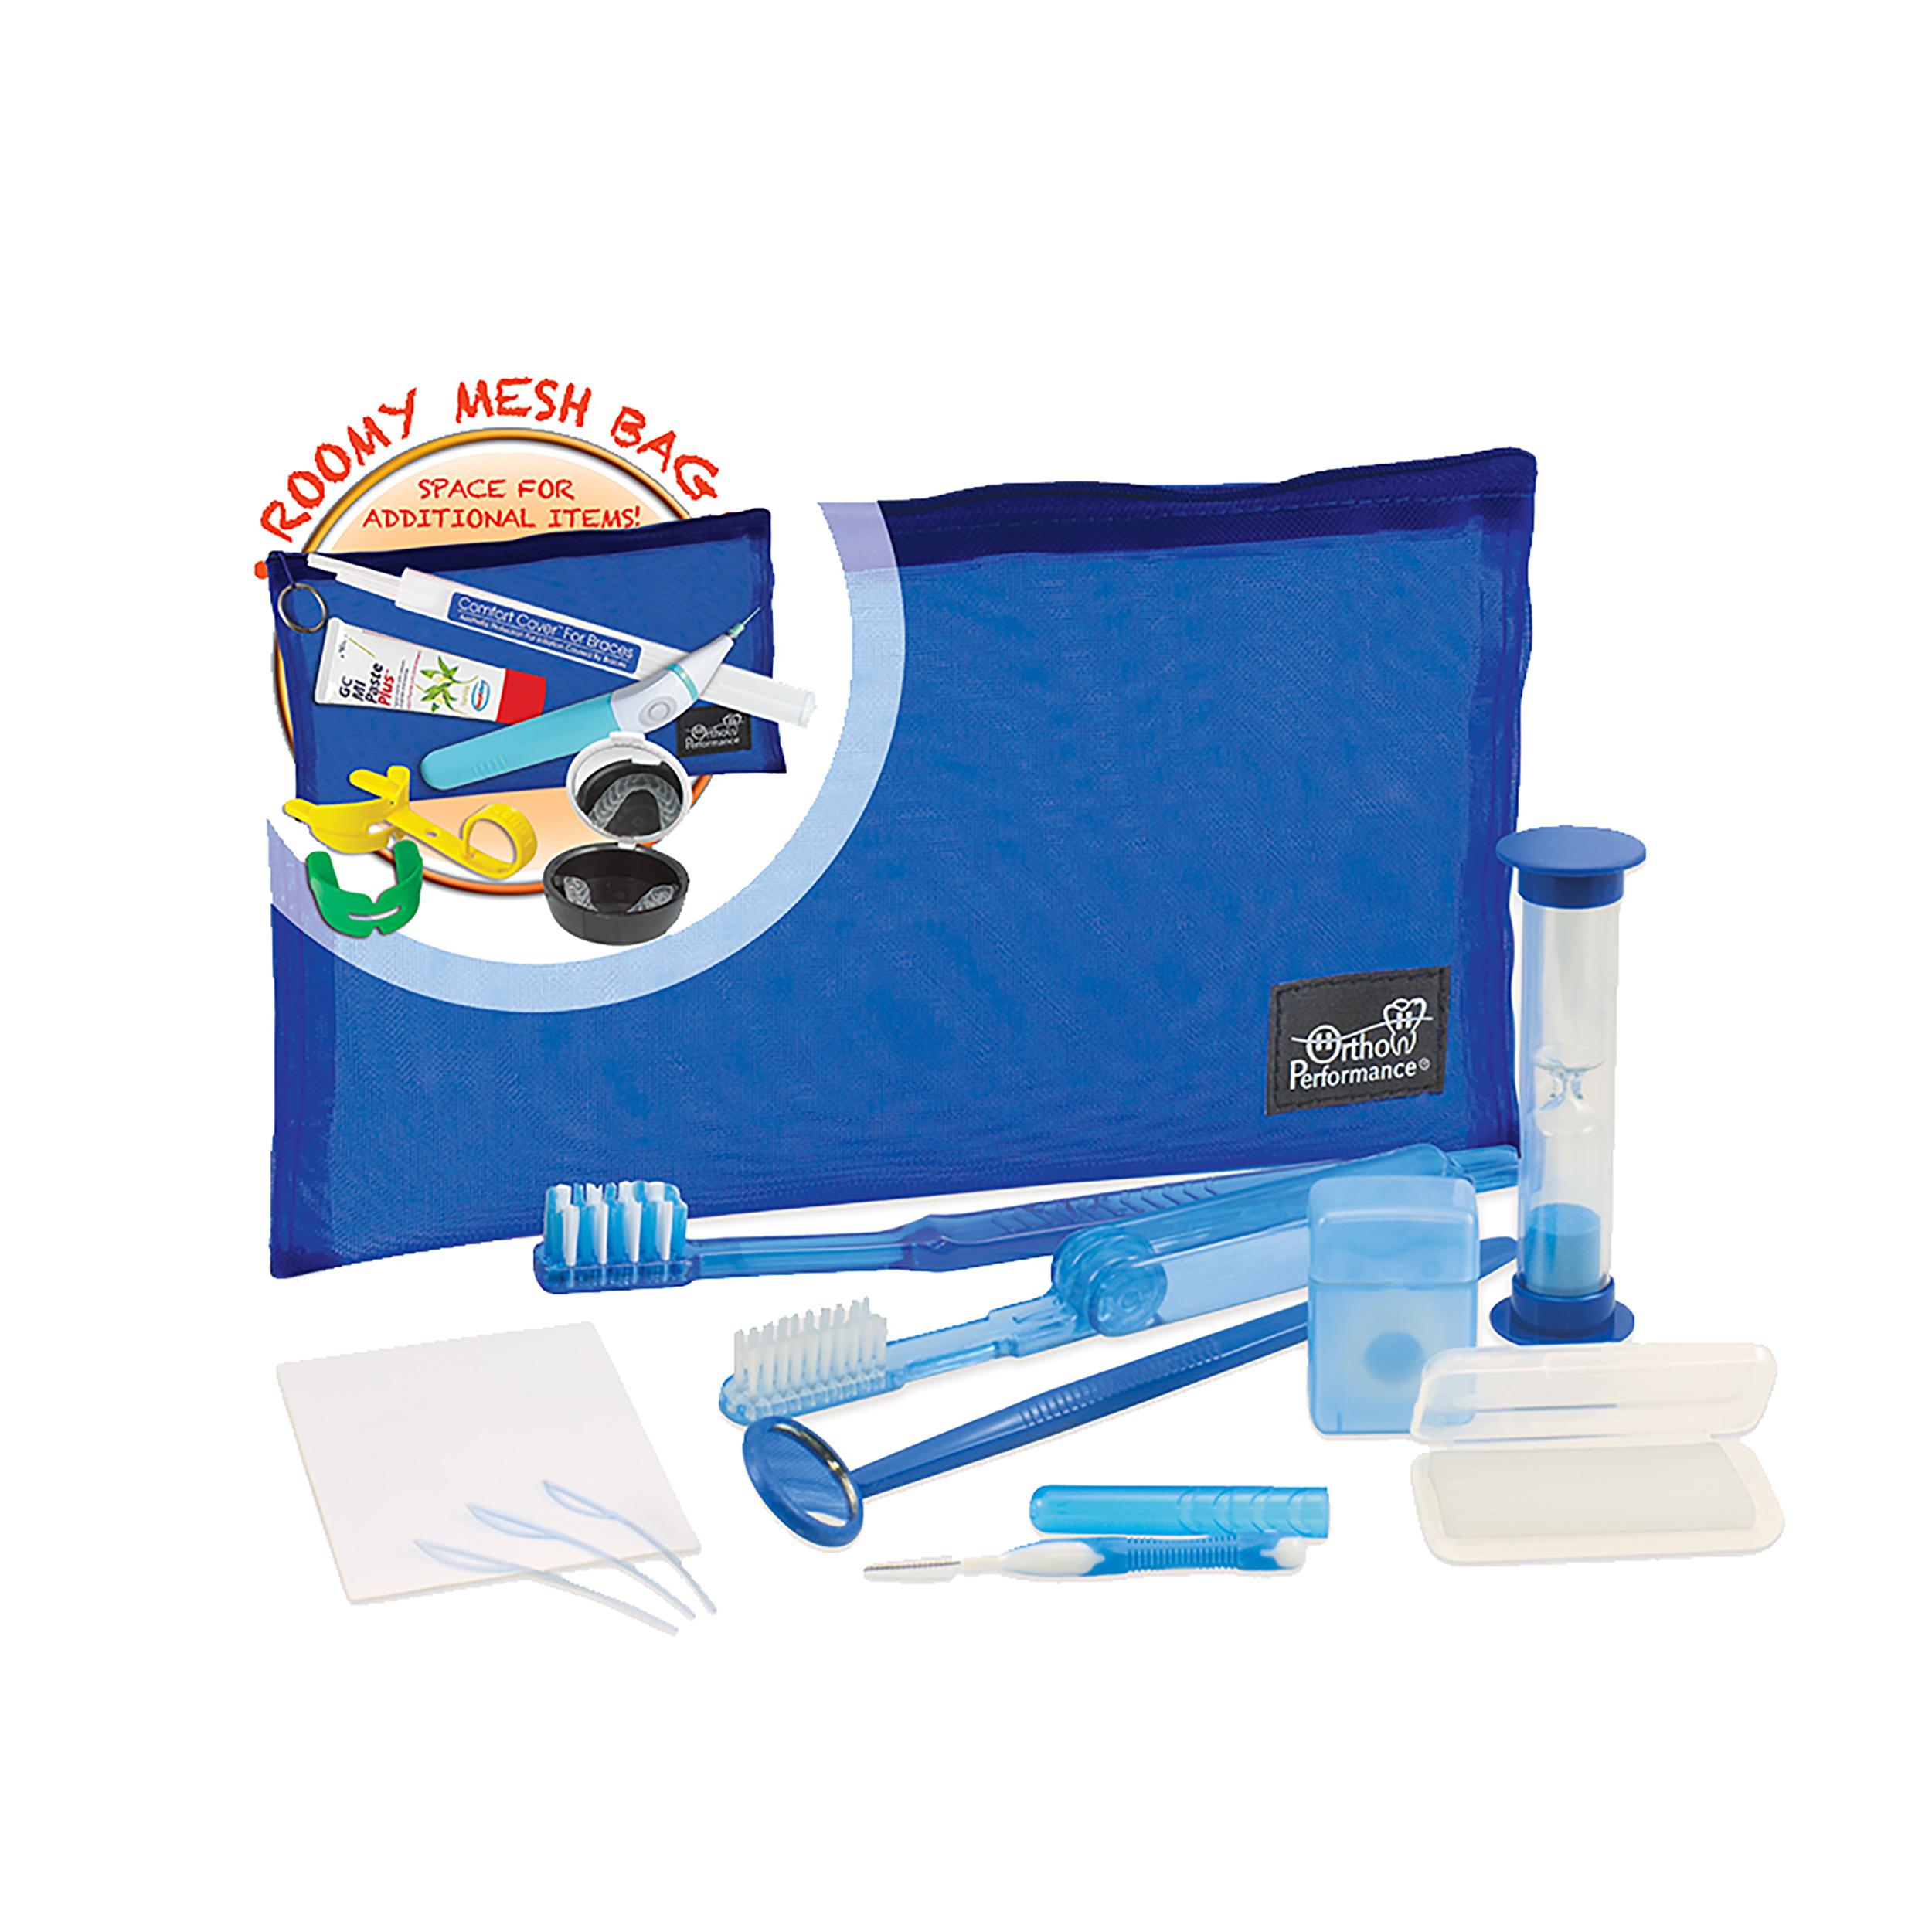 0905297 Ortho Performance Hygiene Kit Kit, 36/Case